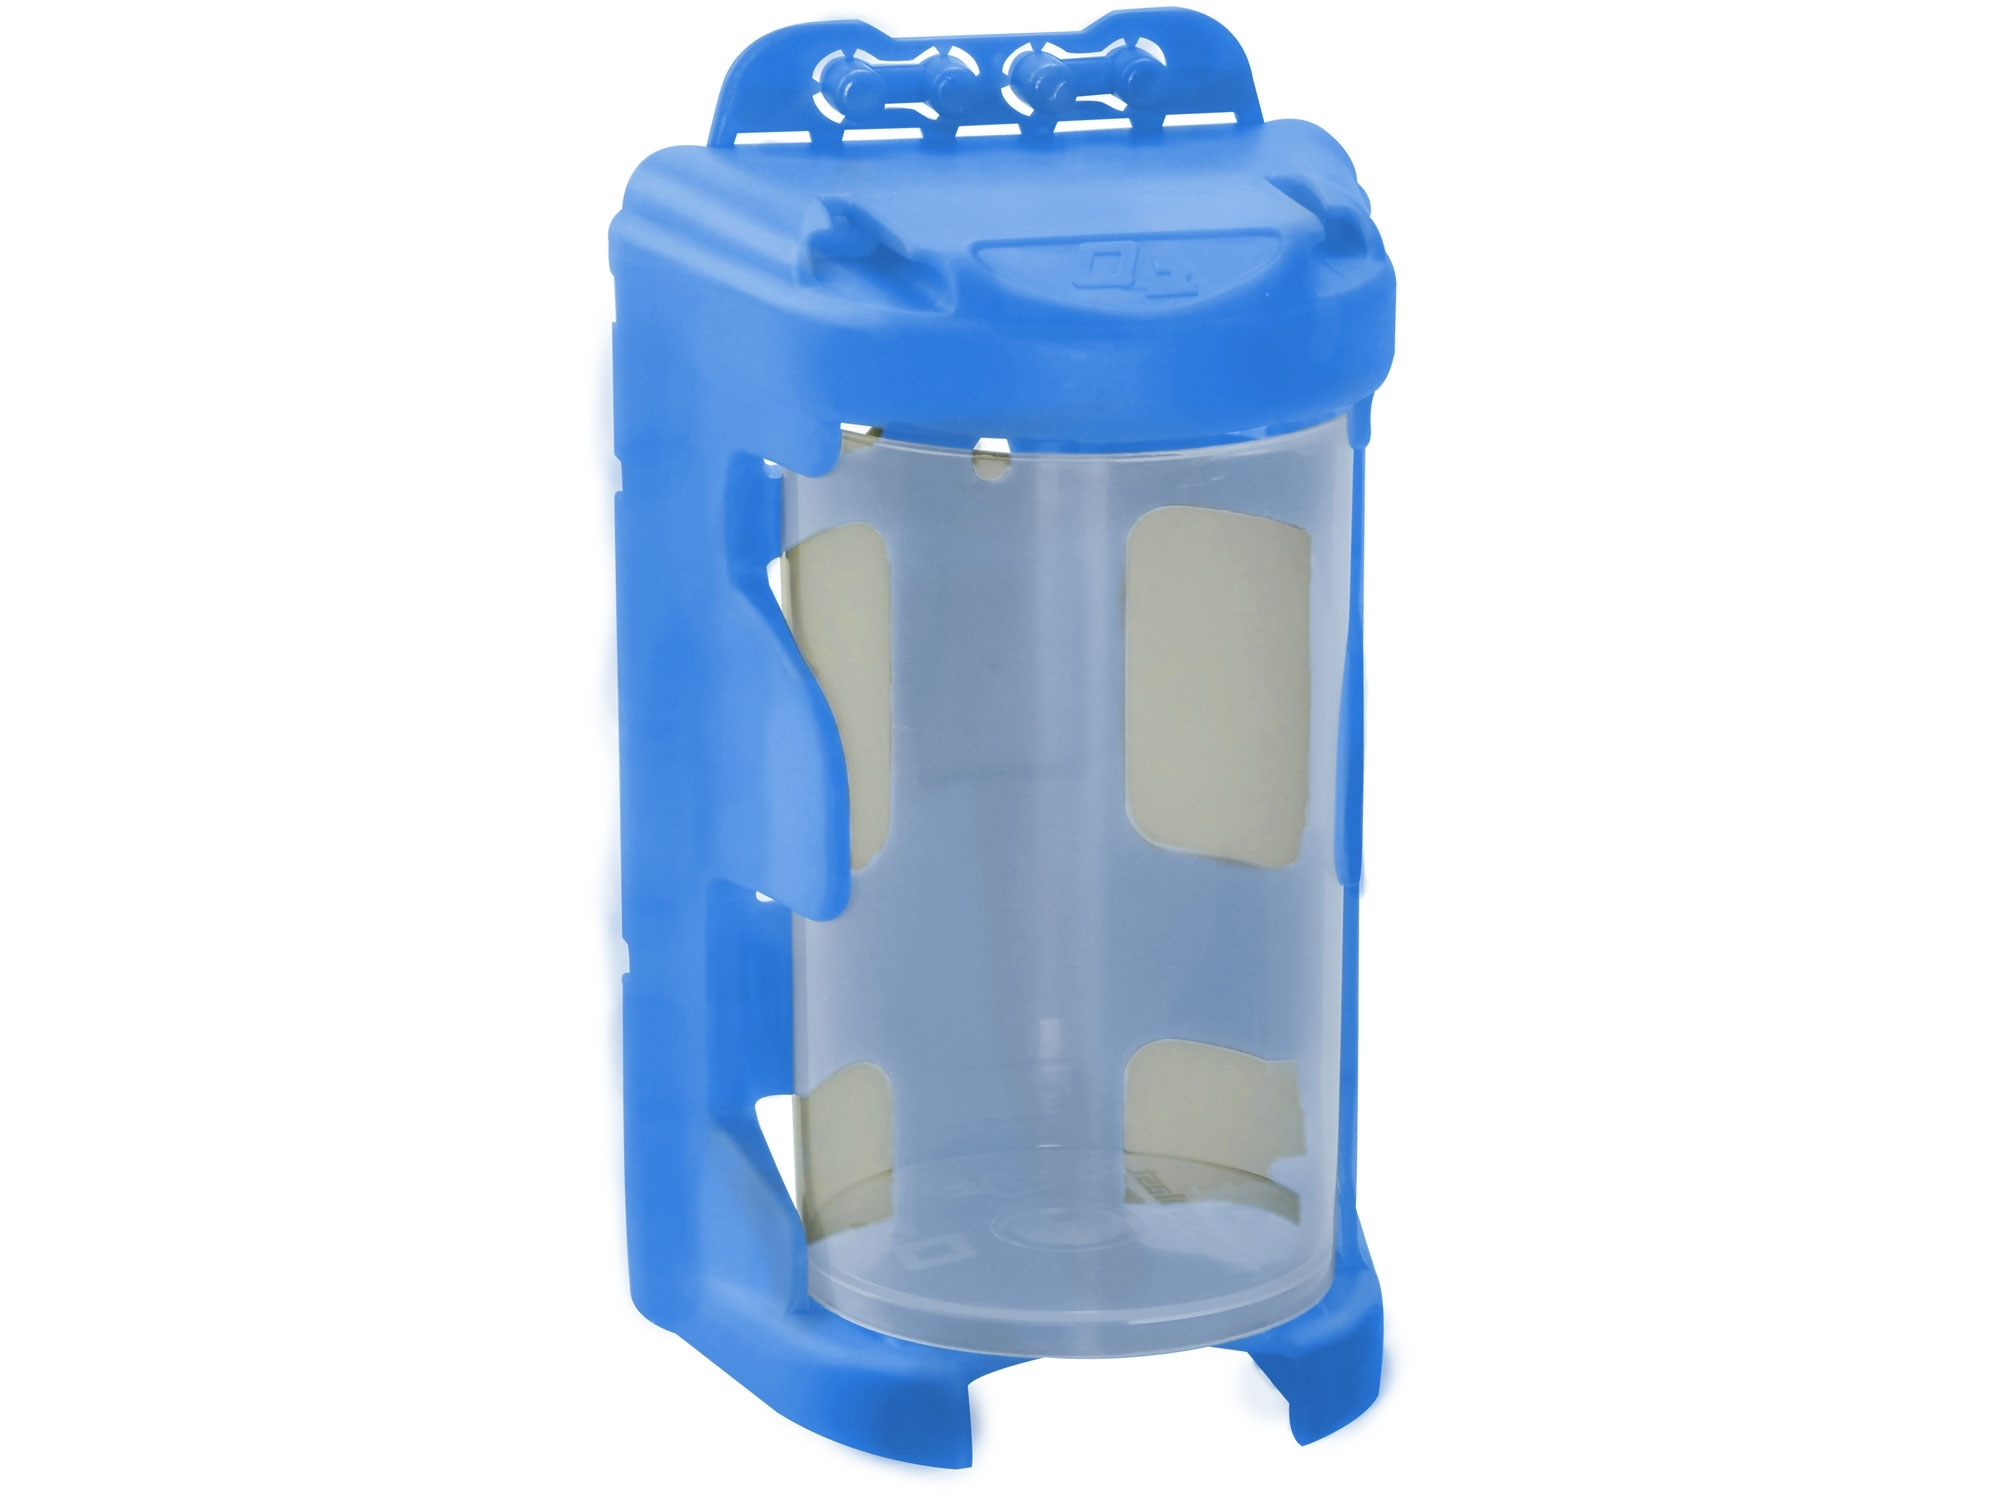 organizér modul. závěsný - modrý, 210ml (60 x 92mm), PP 78912